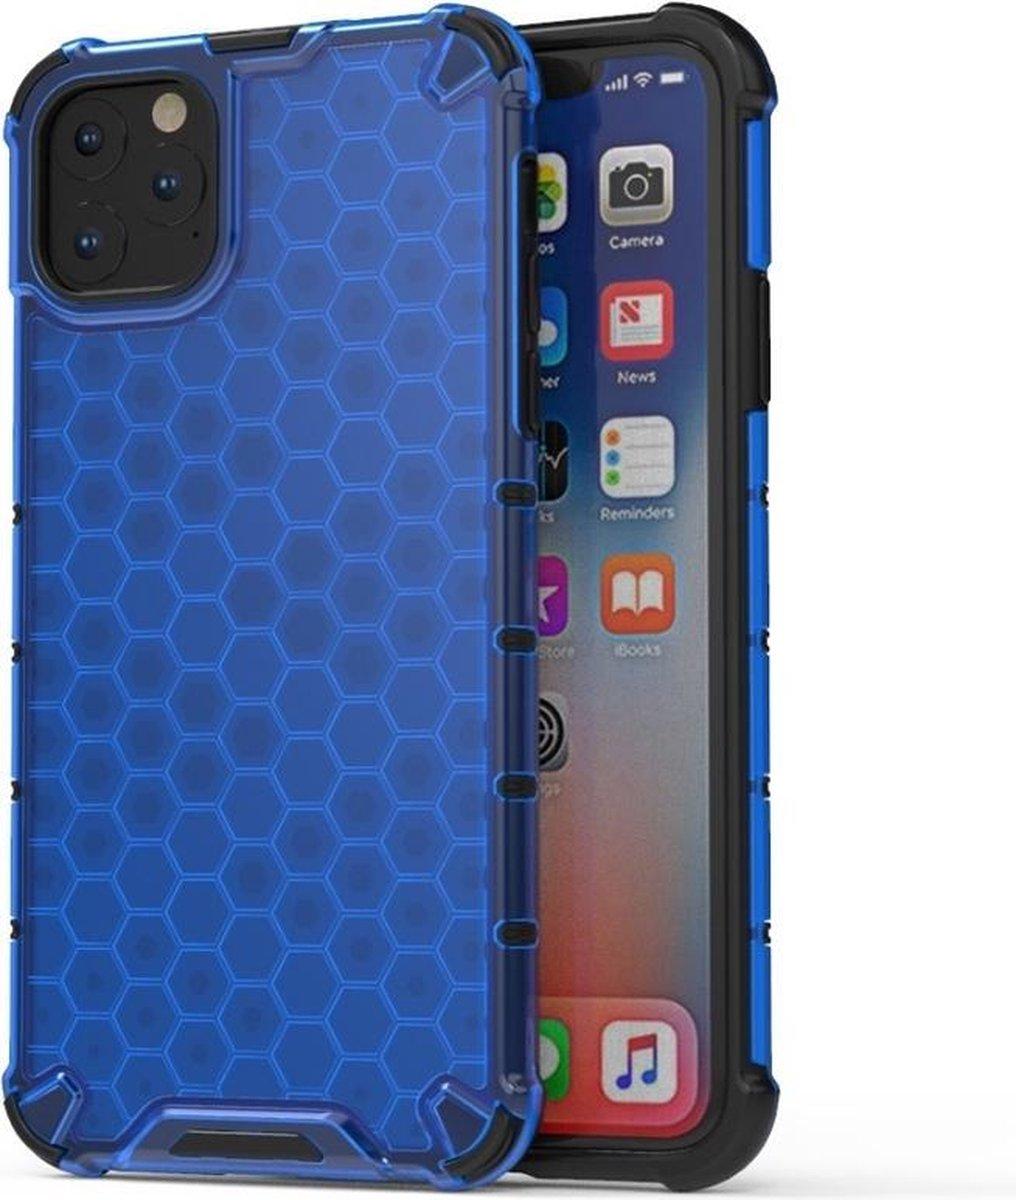 Iphone-cases.nl Elektronica